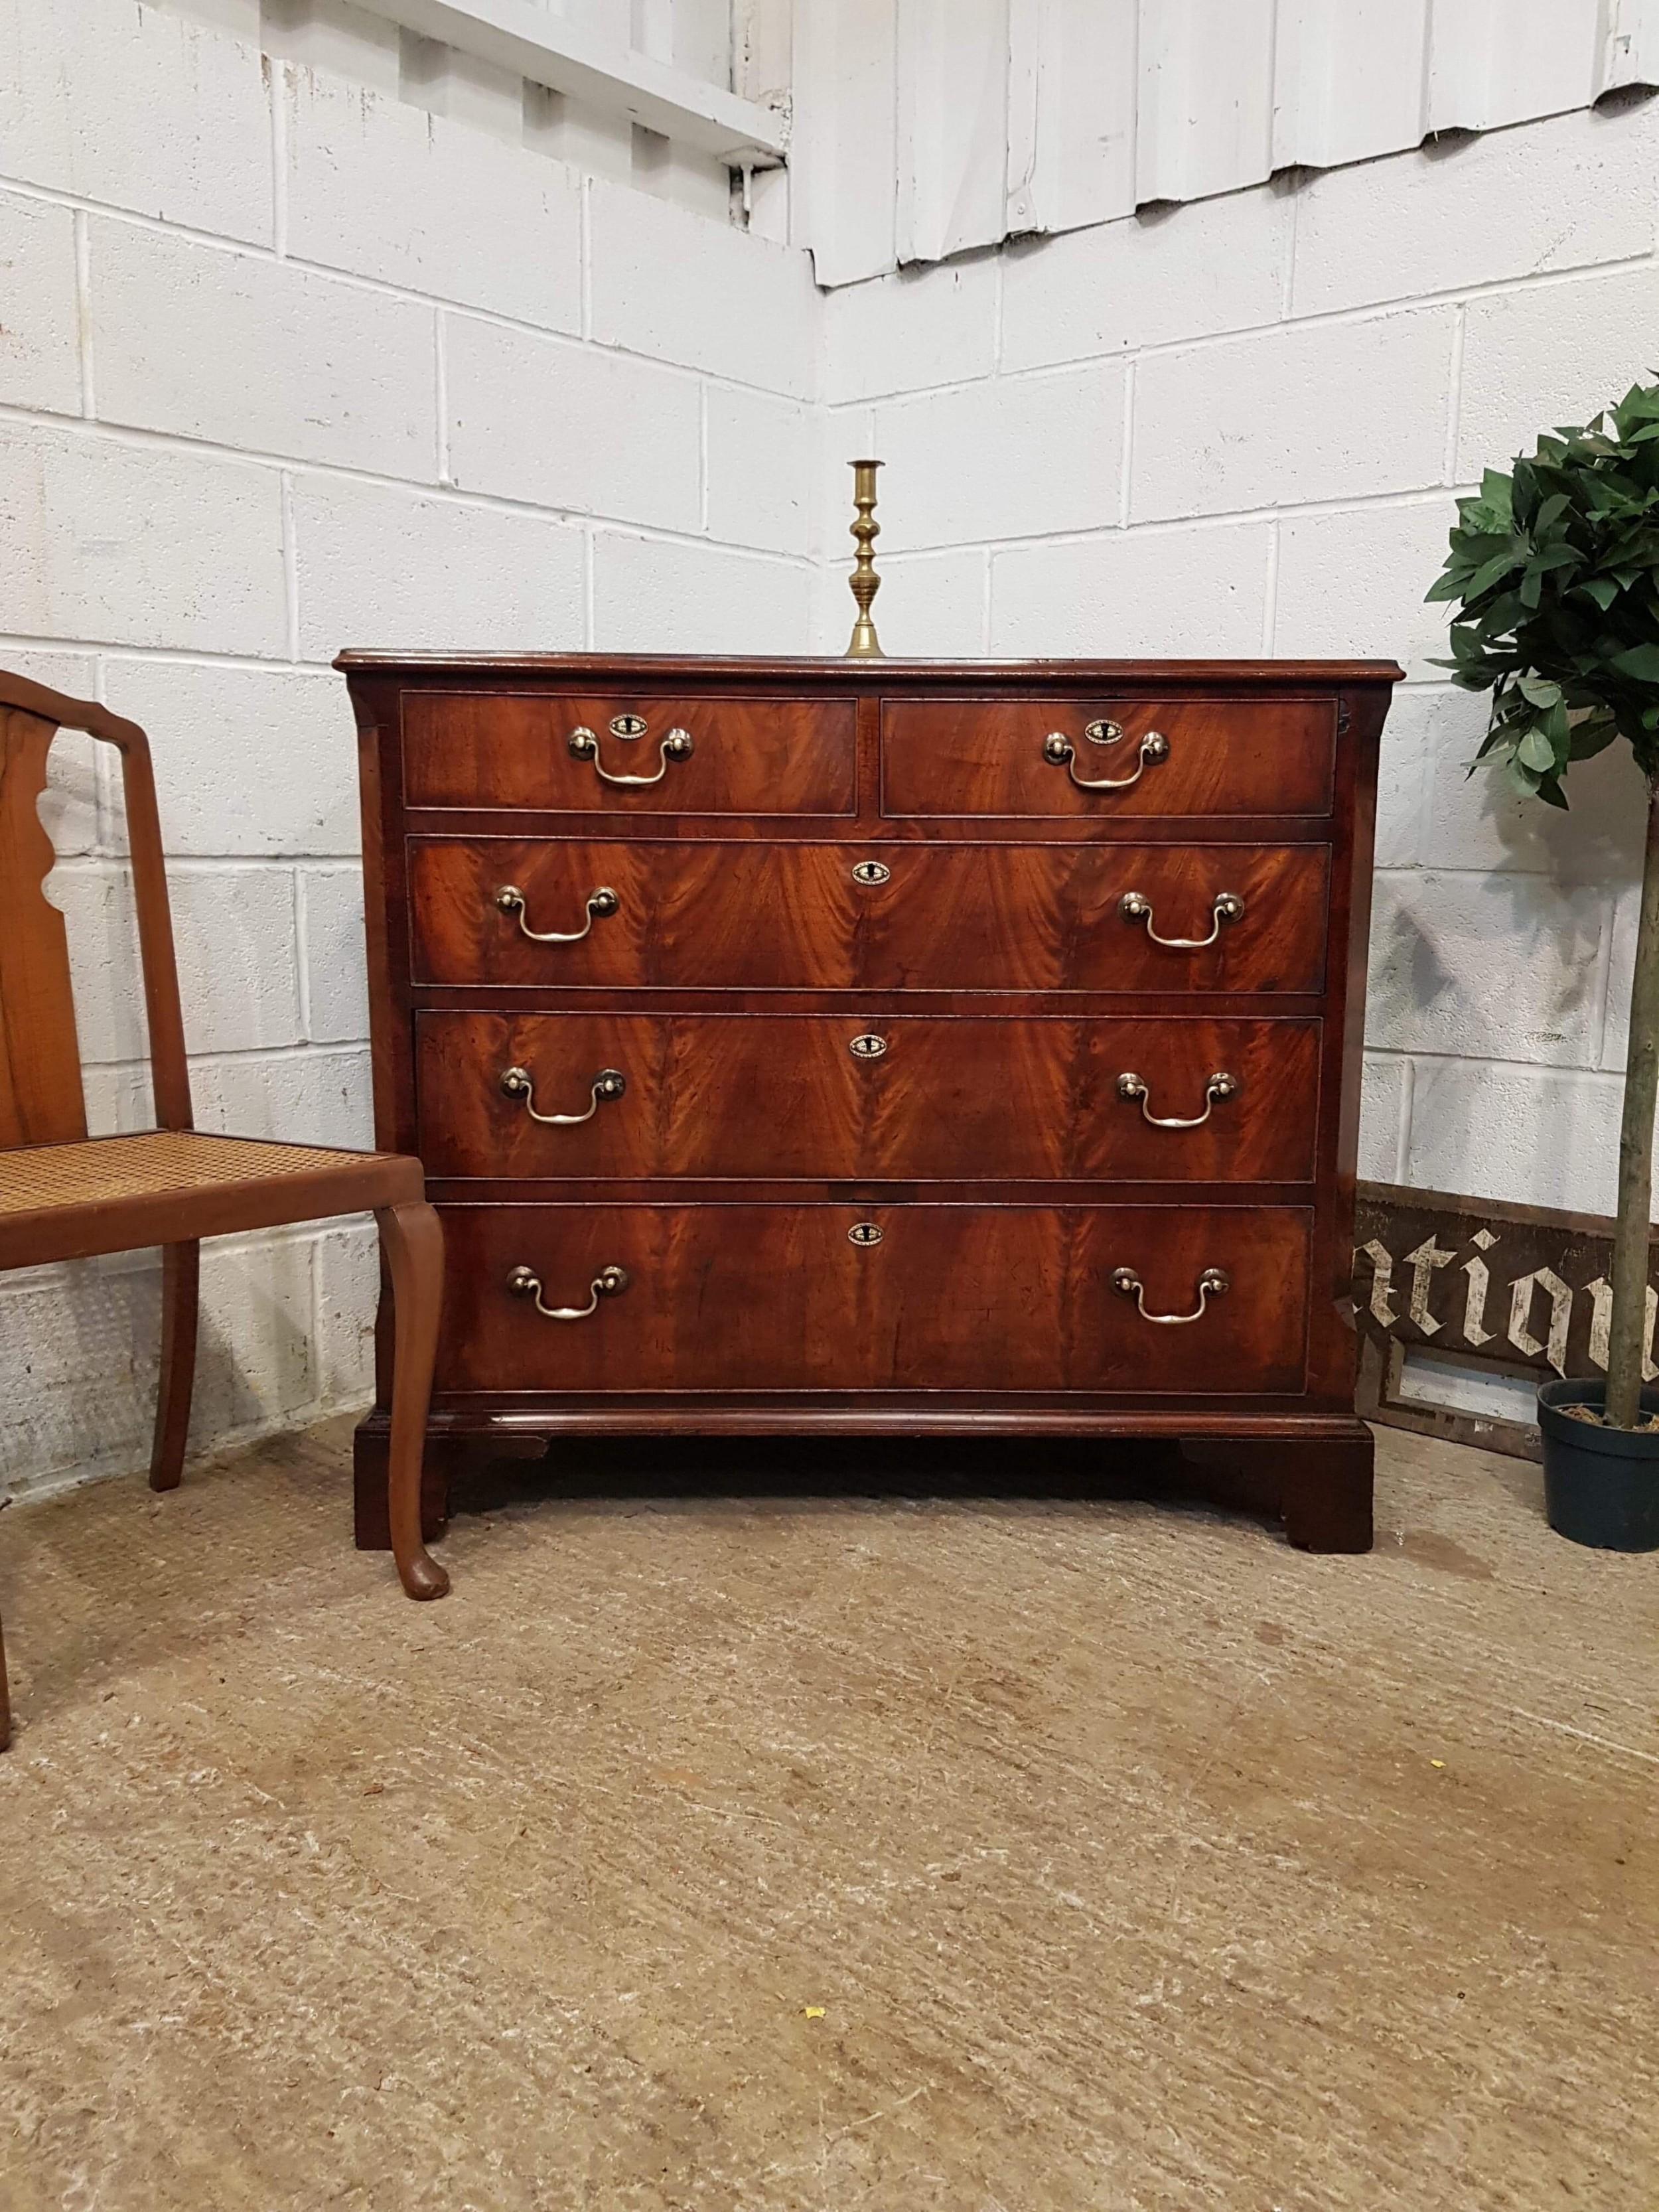 antique 18th century georgian period mahogany chest of drawers c1780